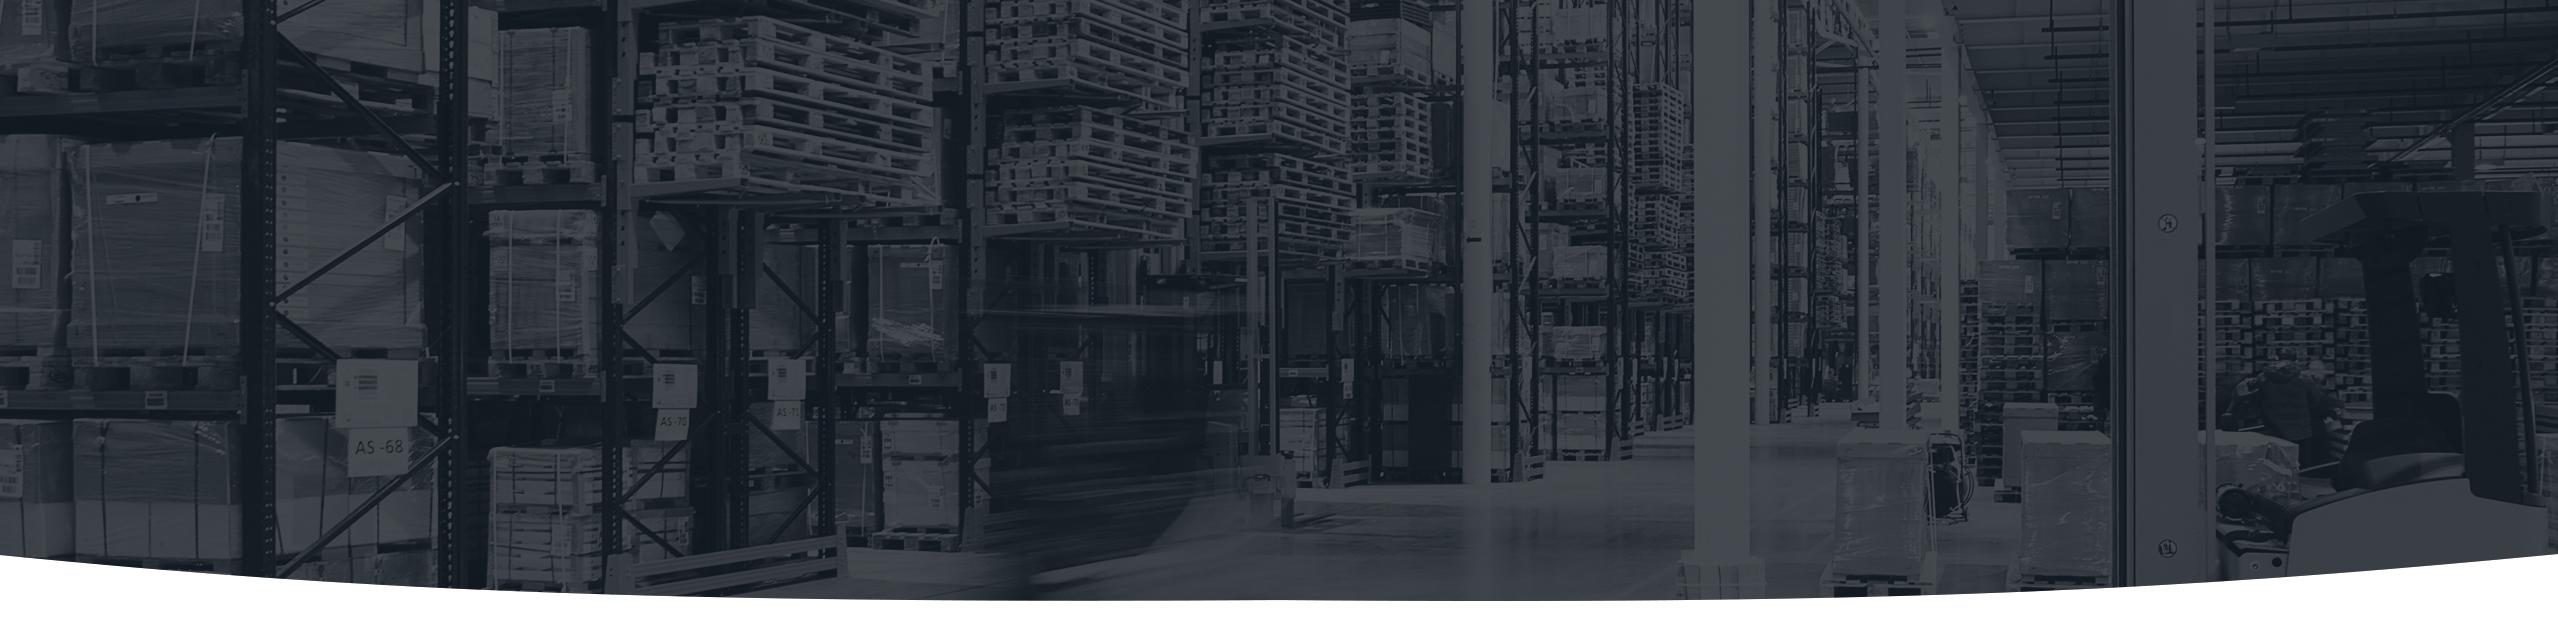 C H  Robinson | Third Party Logistics (3PL) & Supply Chain Management